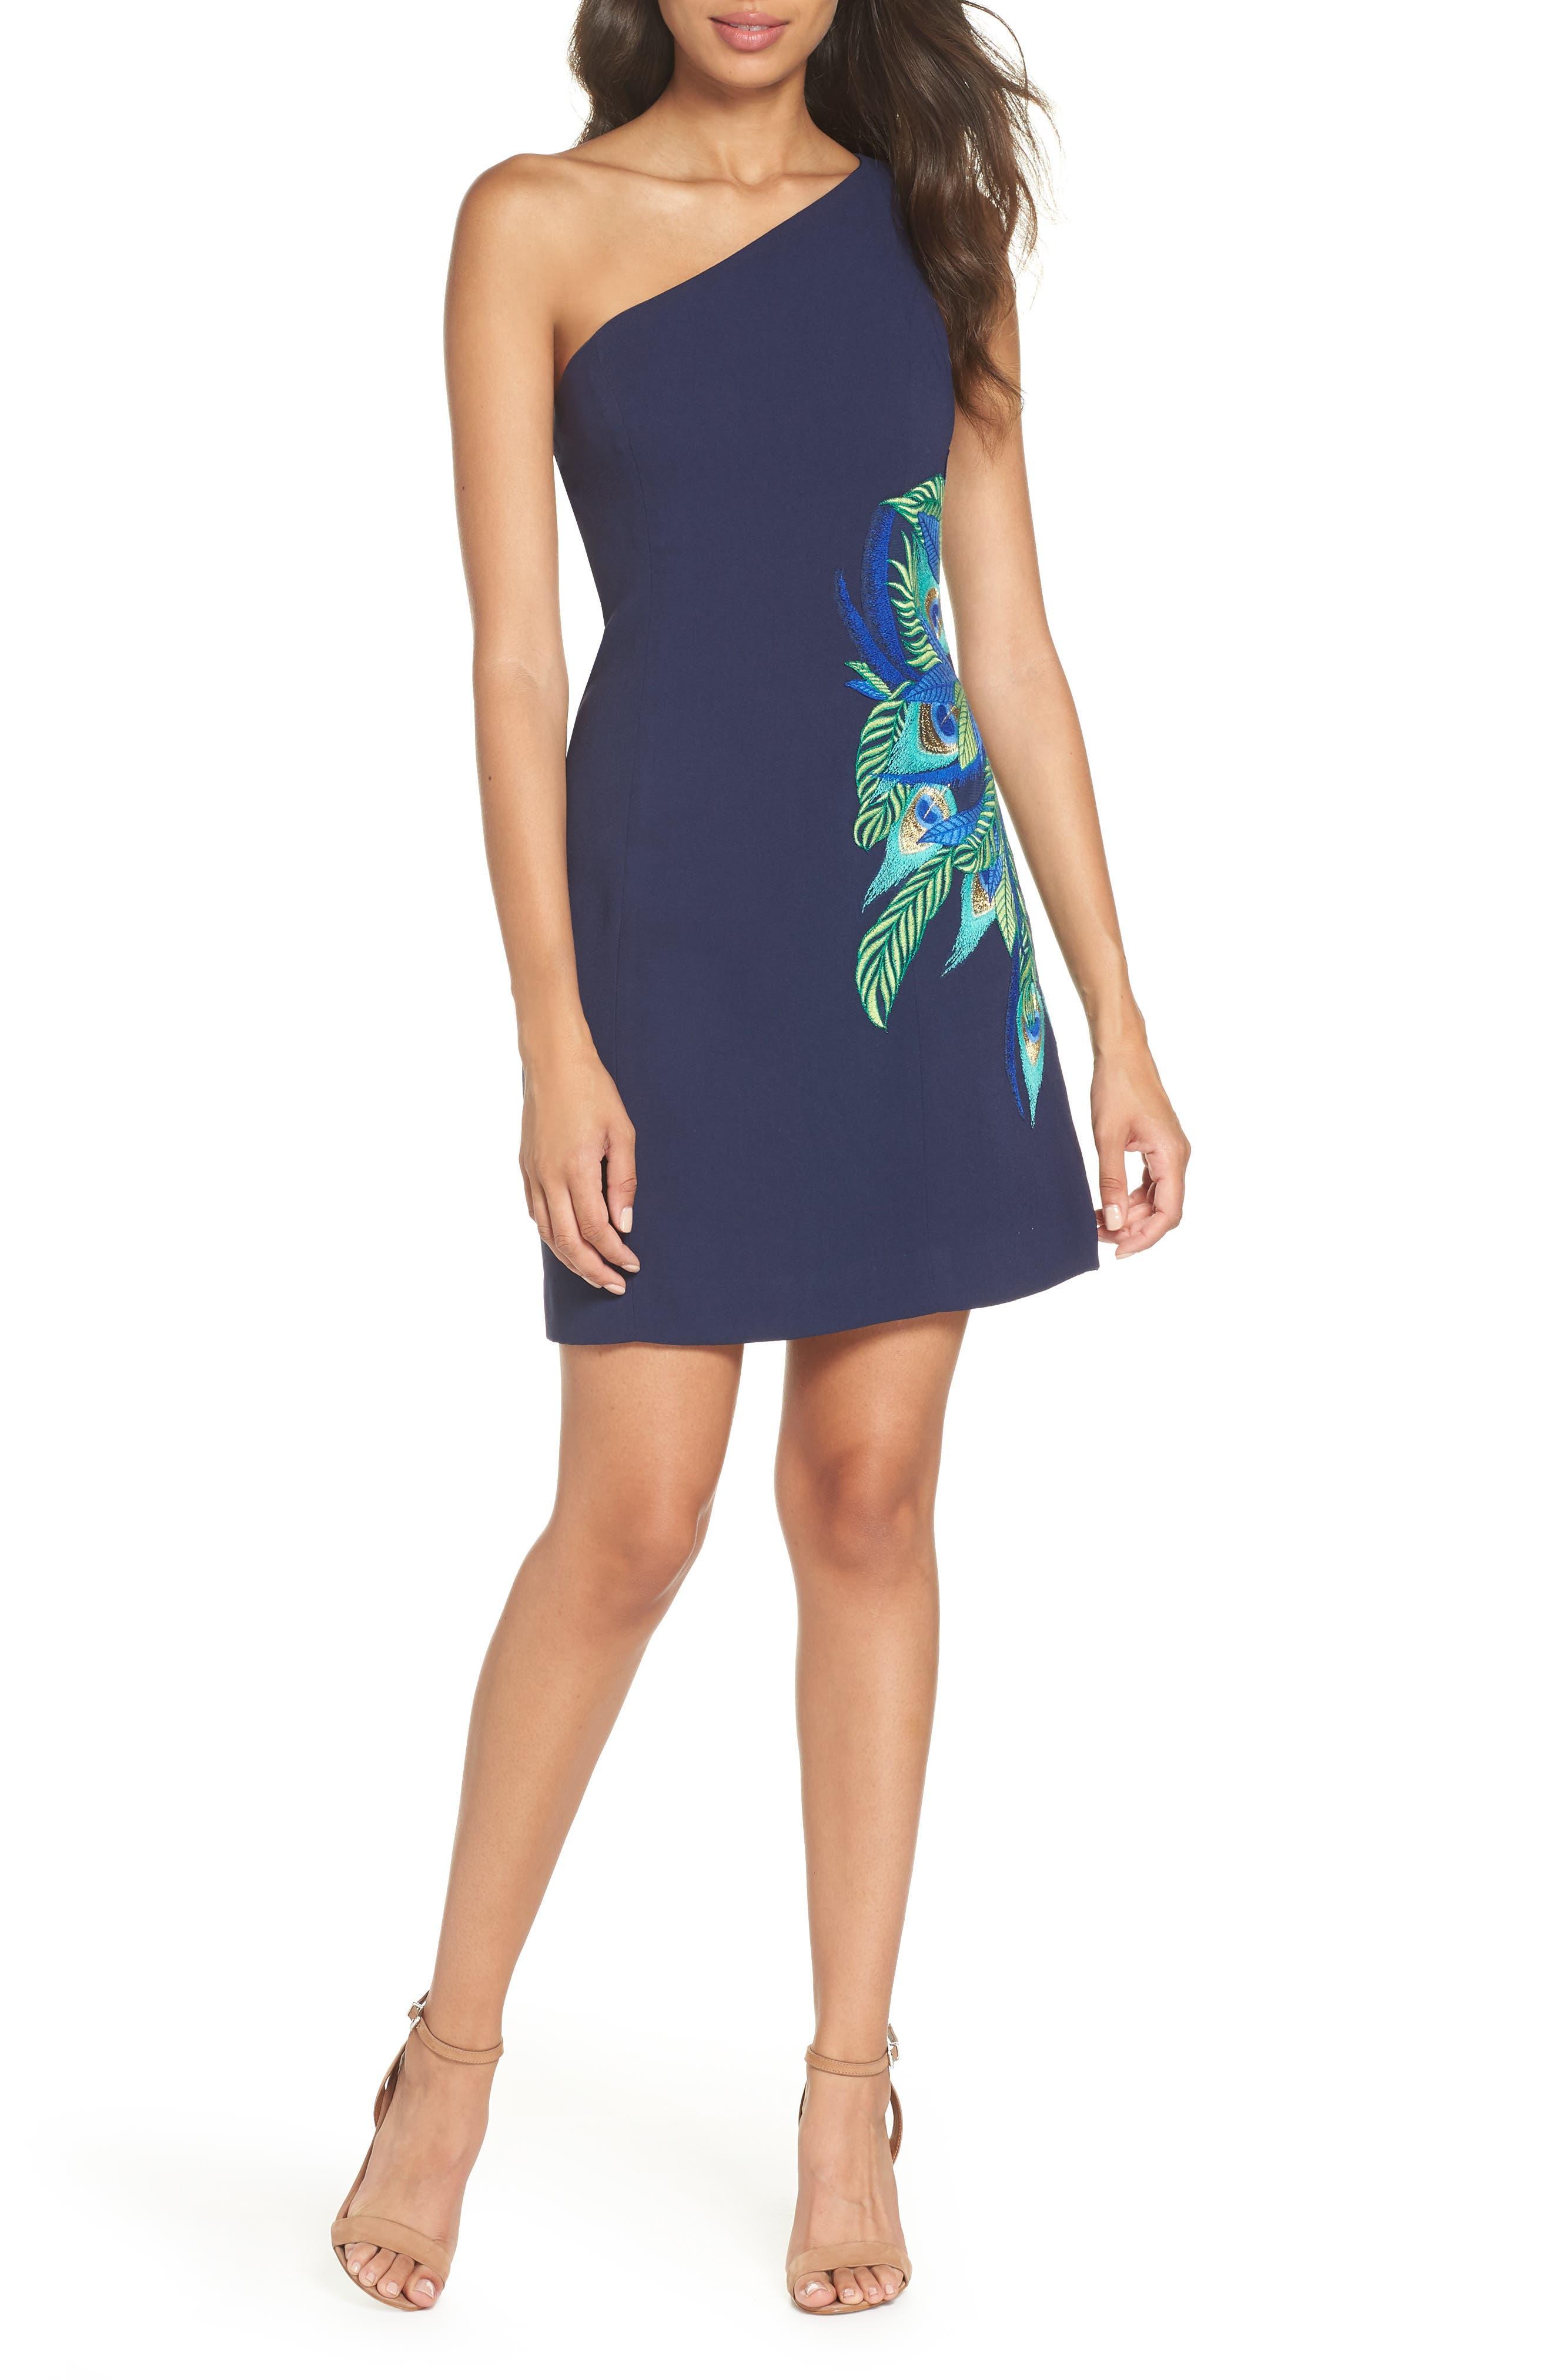 Lily Pulitzer<sup>®</sup> Jamie One-Shoulder Dress,                             Main thumbnail 1, color,                             TRUE NAVY